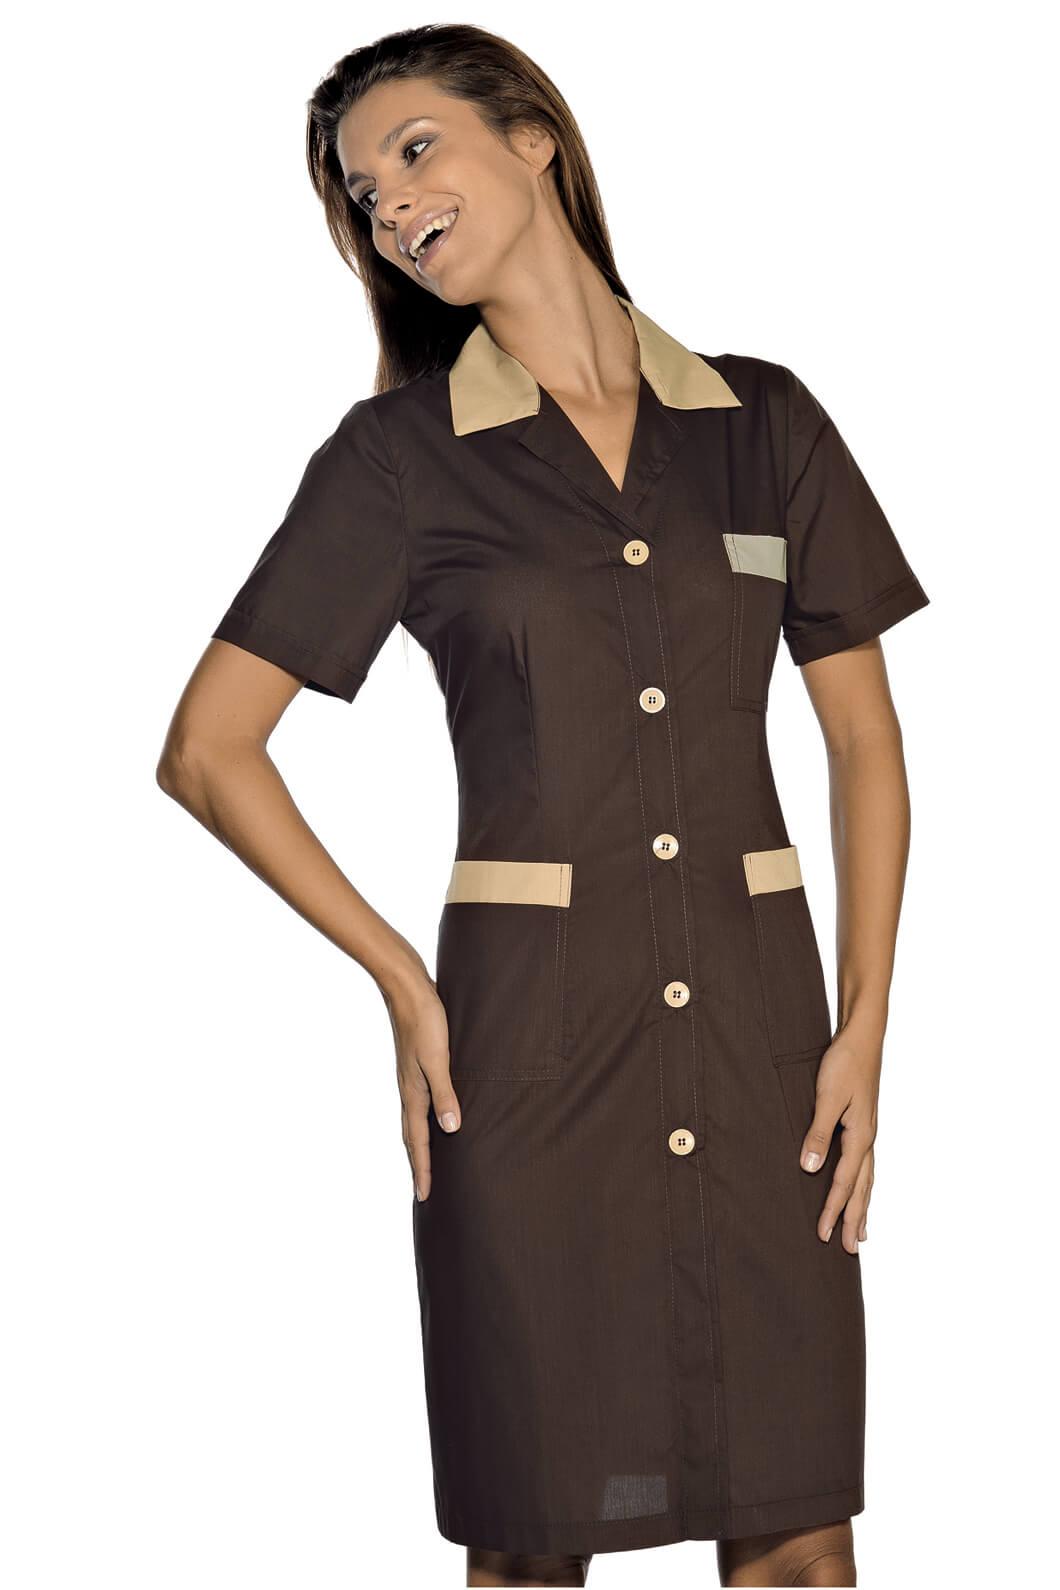 blouse de travail manches courtes positano marron cacao. Black Bedroom Furniture Sets. Home Design Ideas